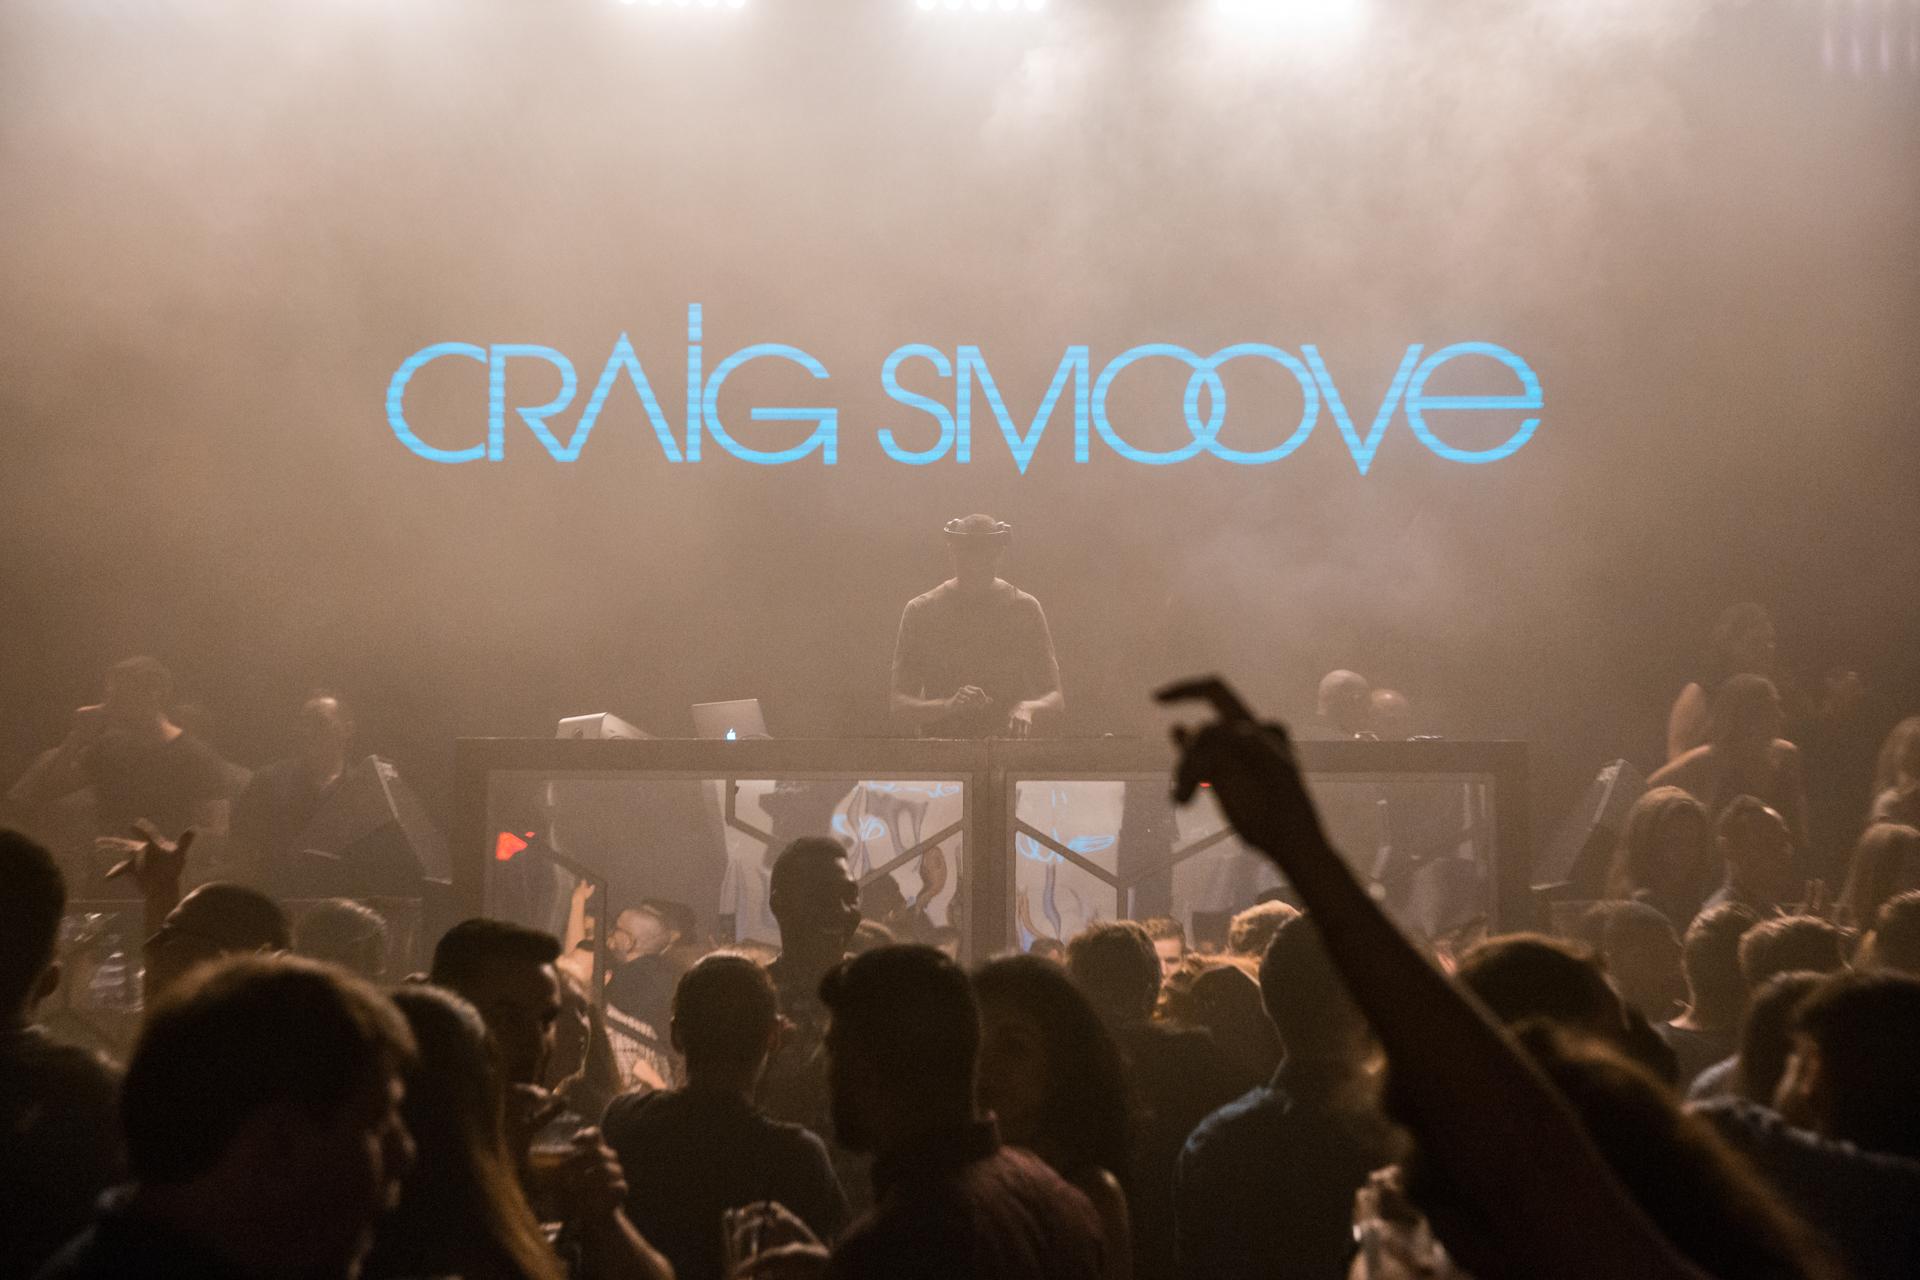 07.07.17  Craig Smoove--1.jpg